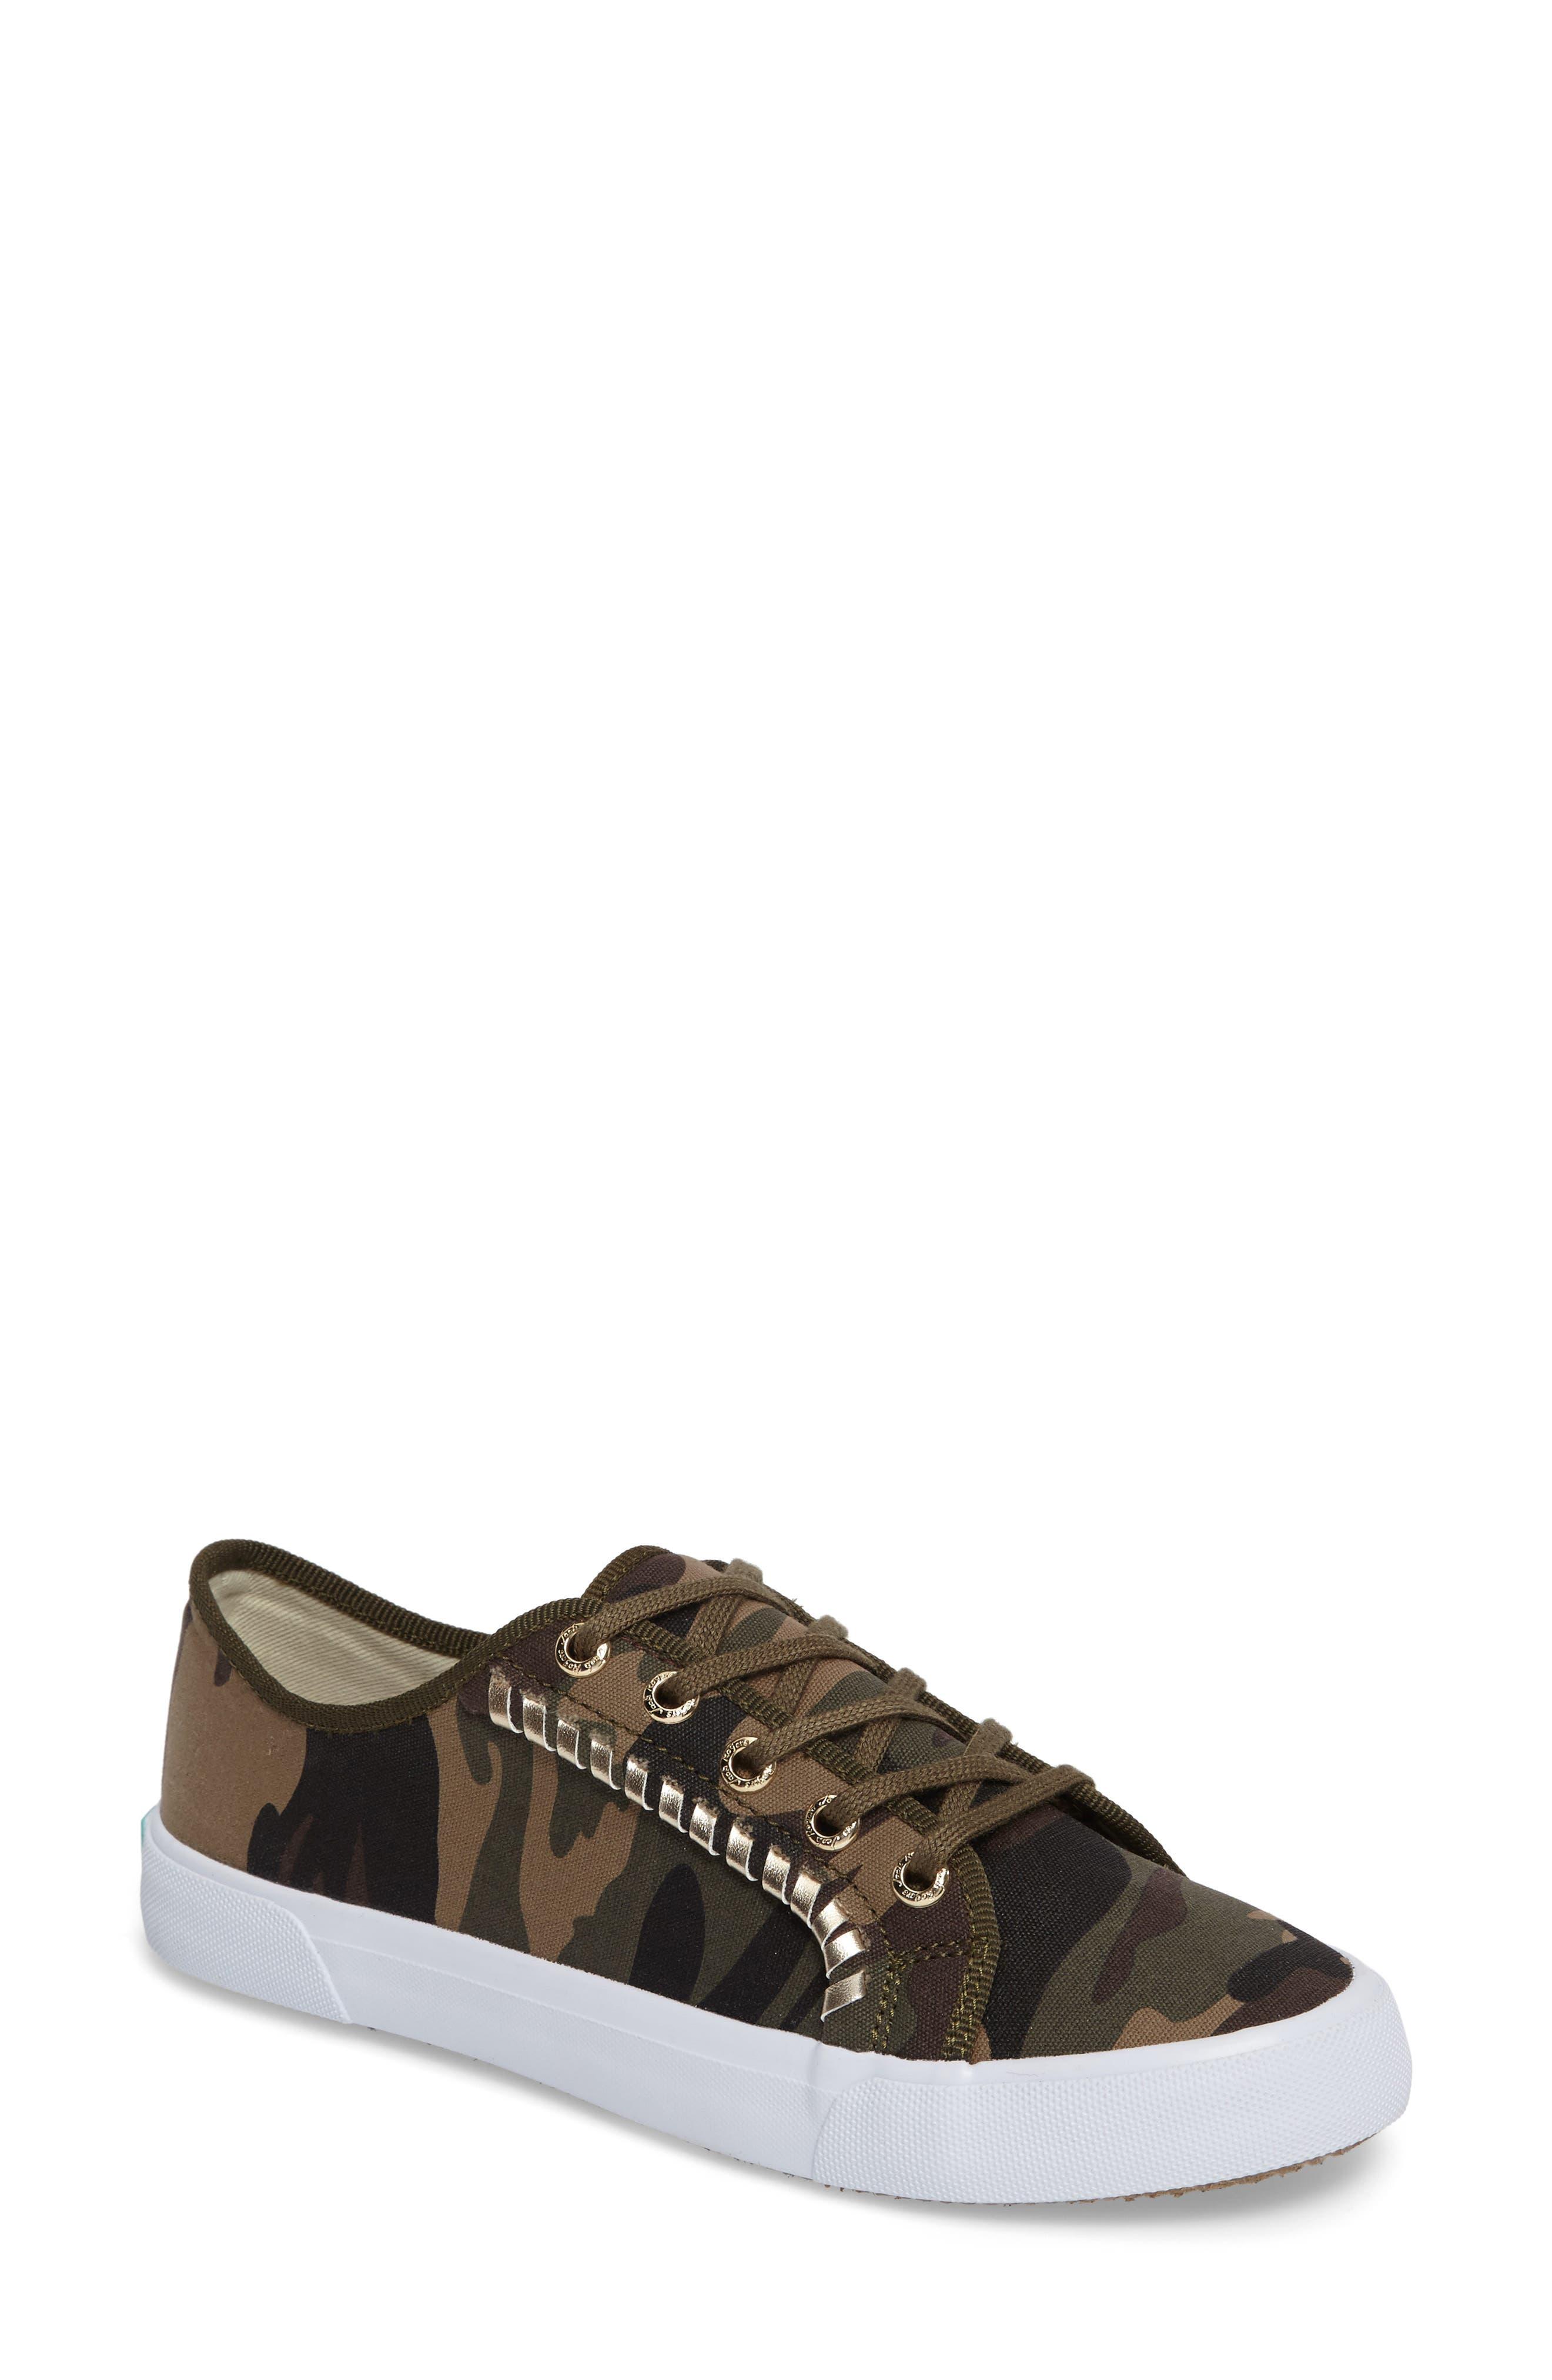 JACK ROGERS Carter Sneaker